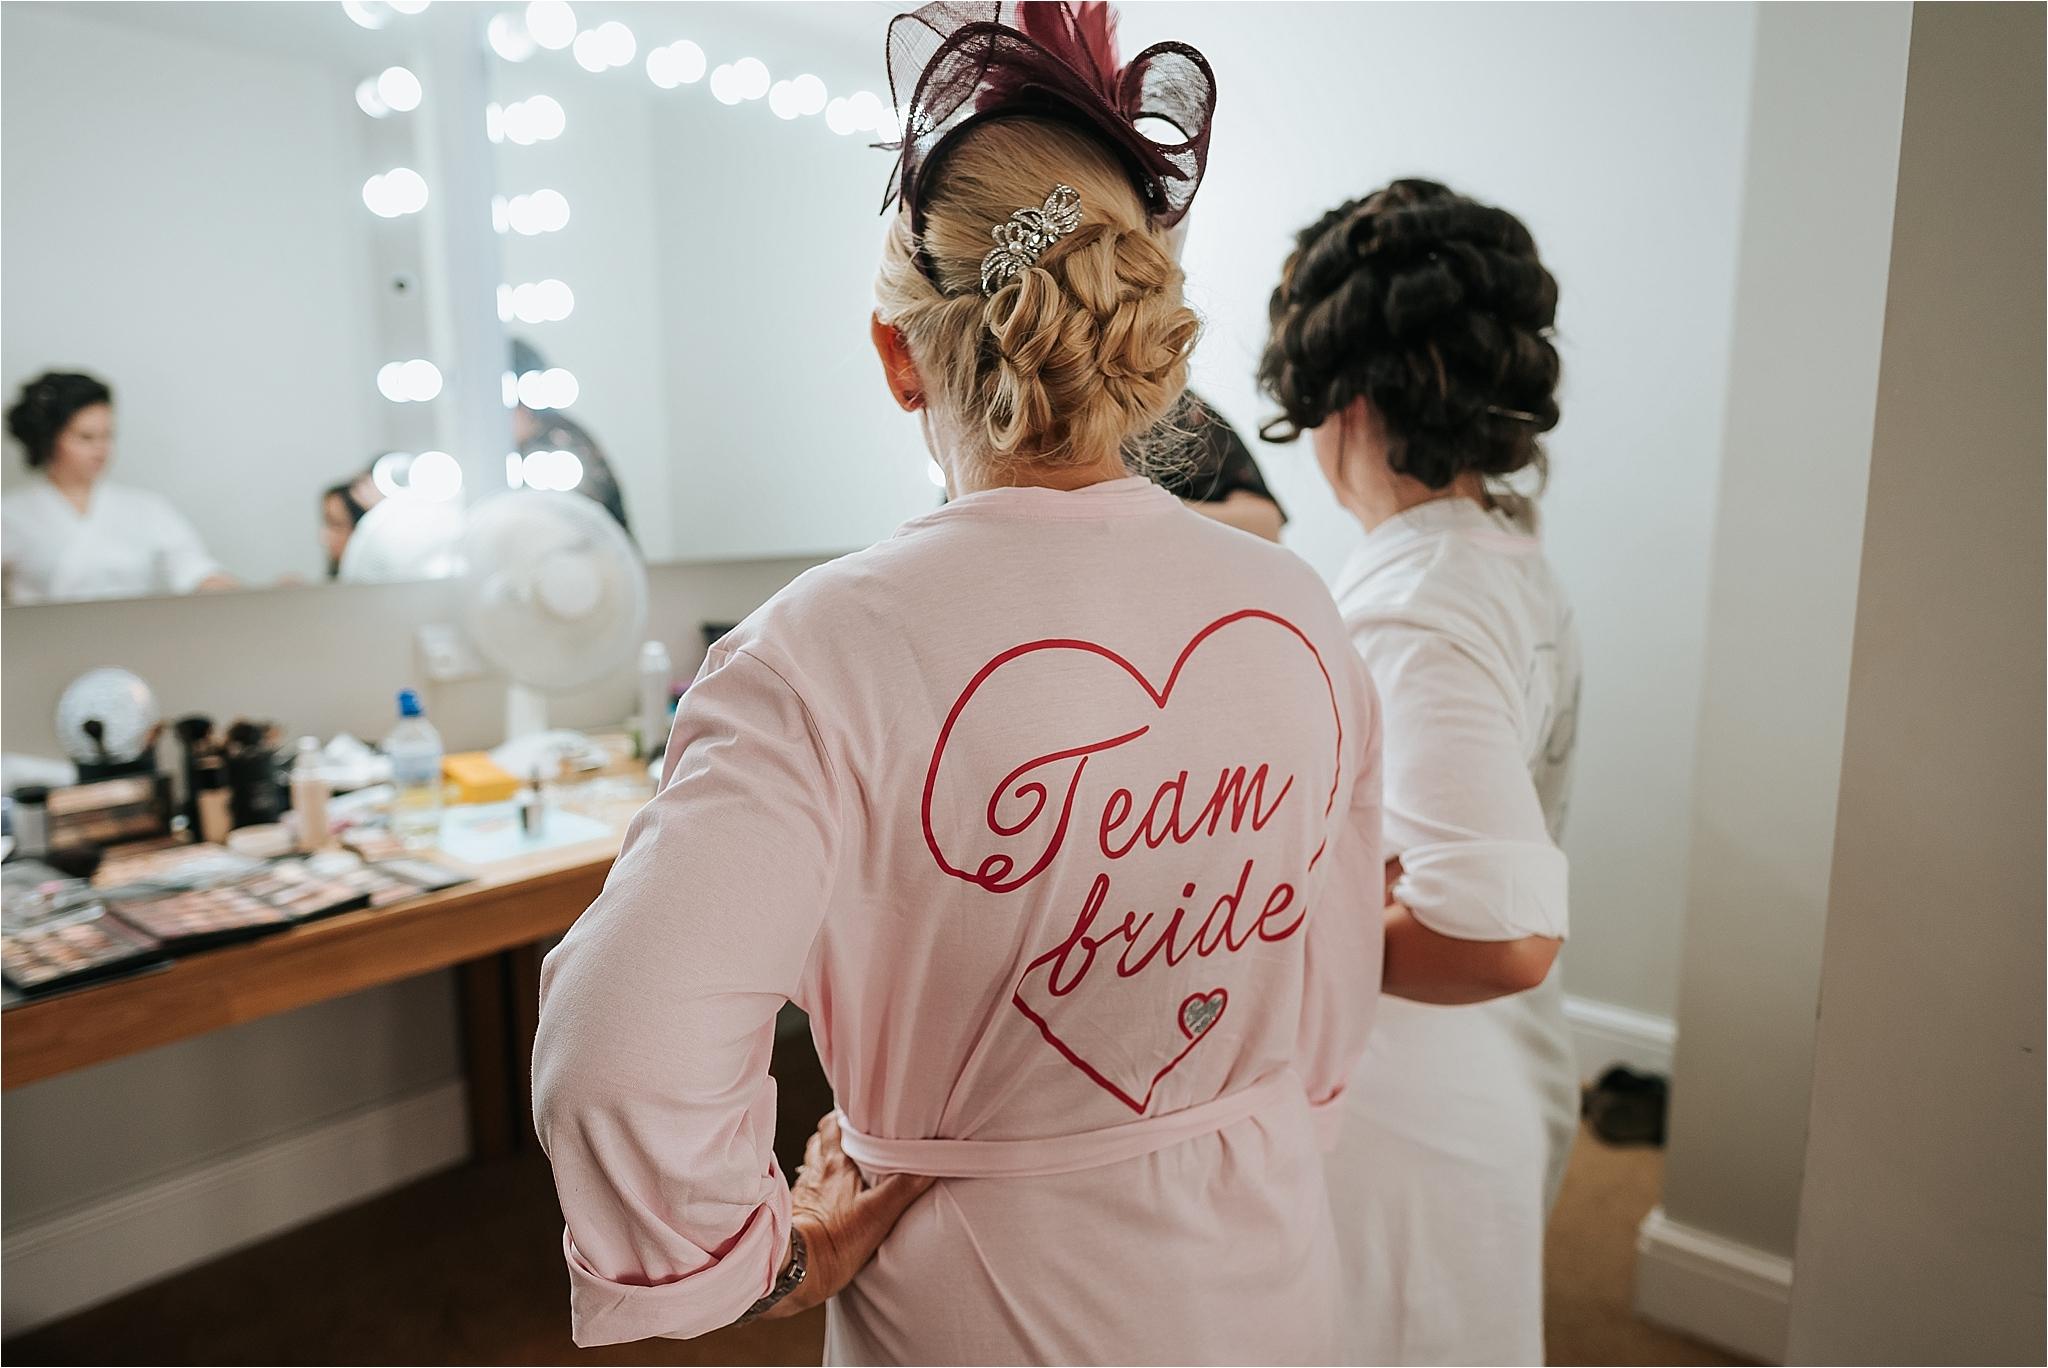 thevilla+lancashire+wreagreen+wedding+photographer79.jpg